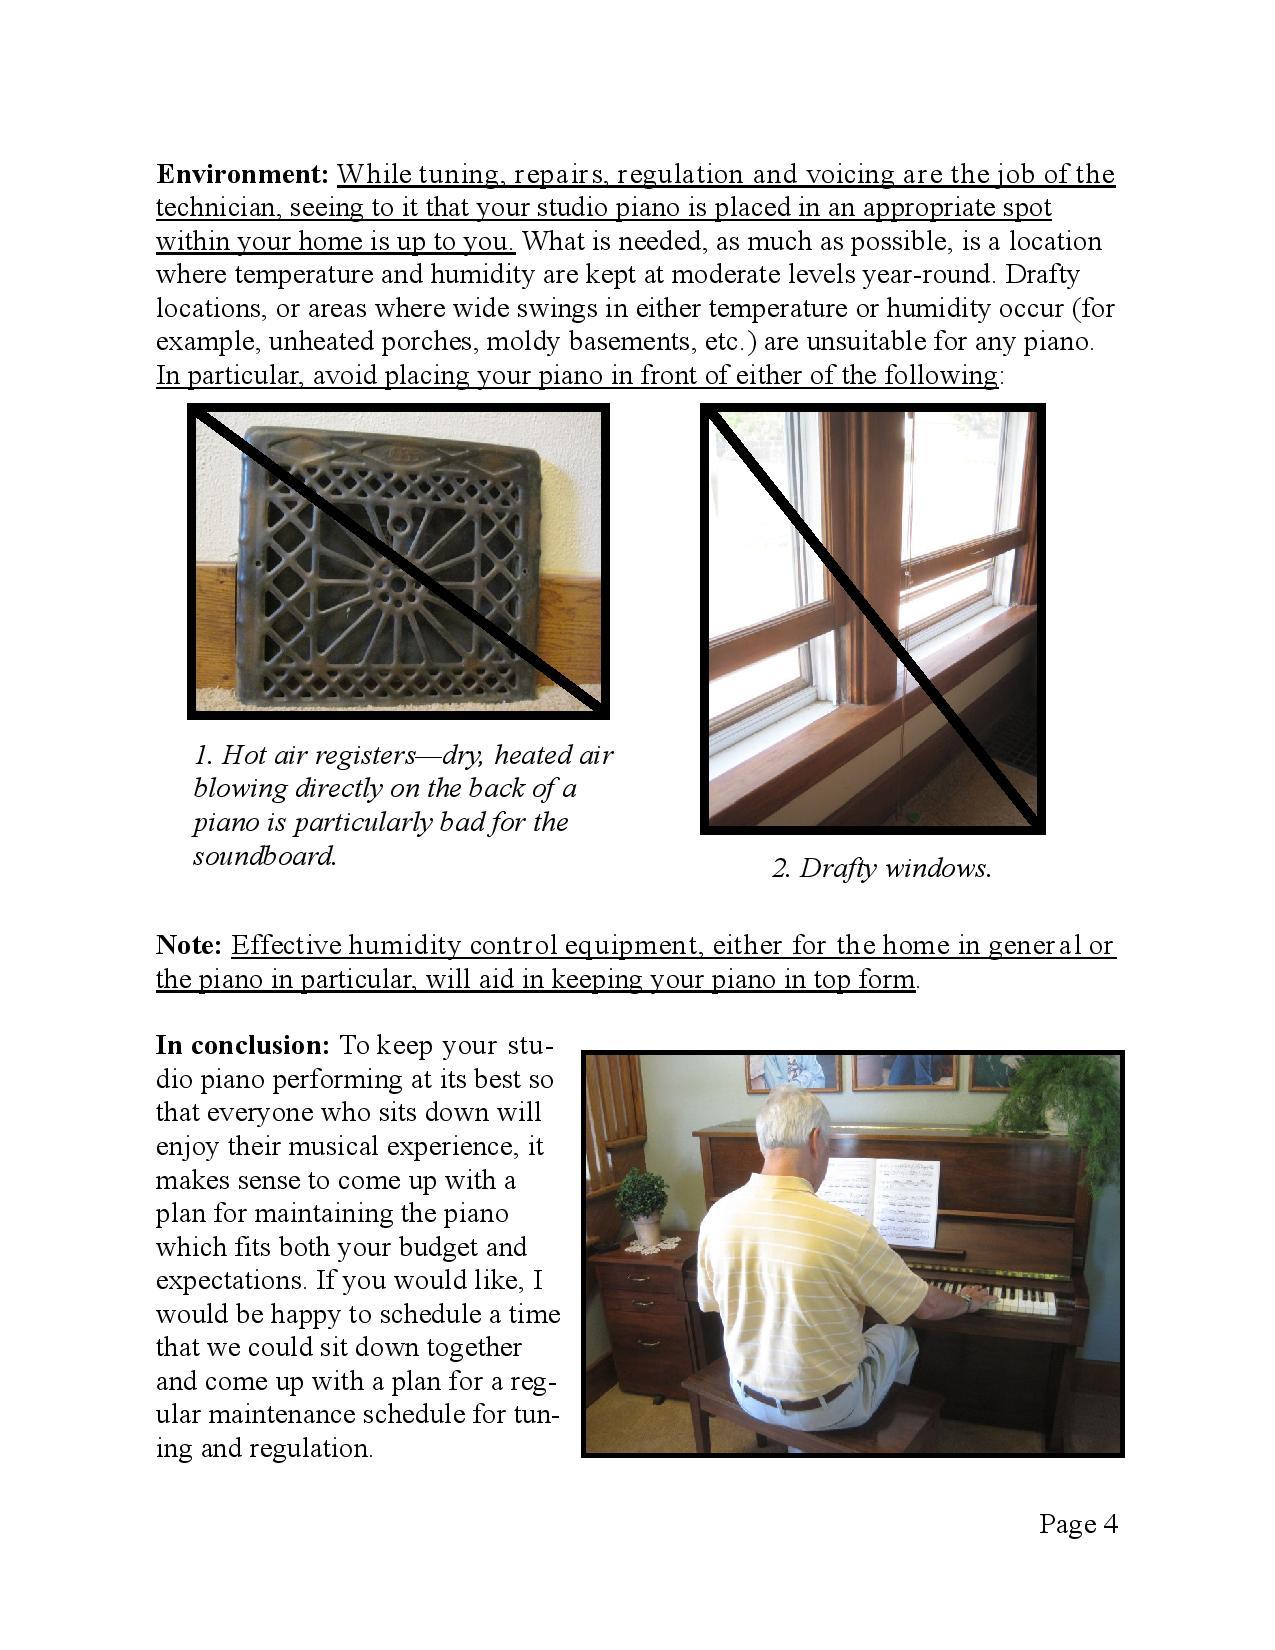 46a._Studio_Maintenance_Promo_-_Ben_Giroux-page-004[1].jpg